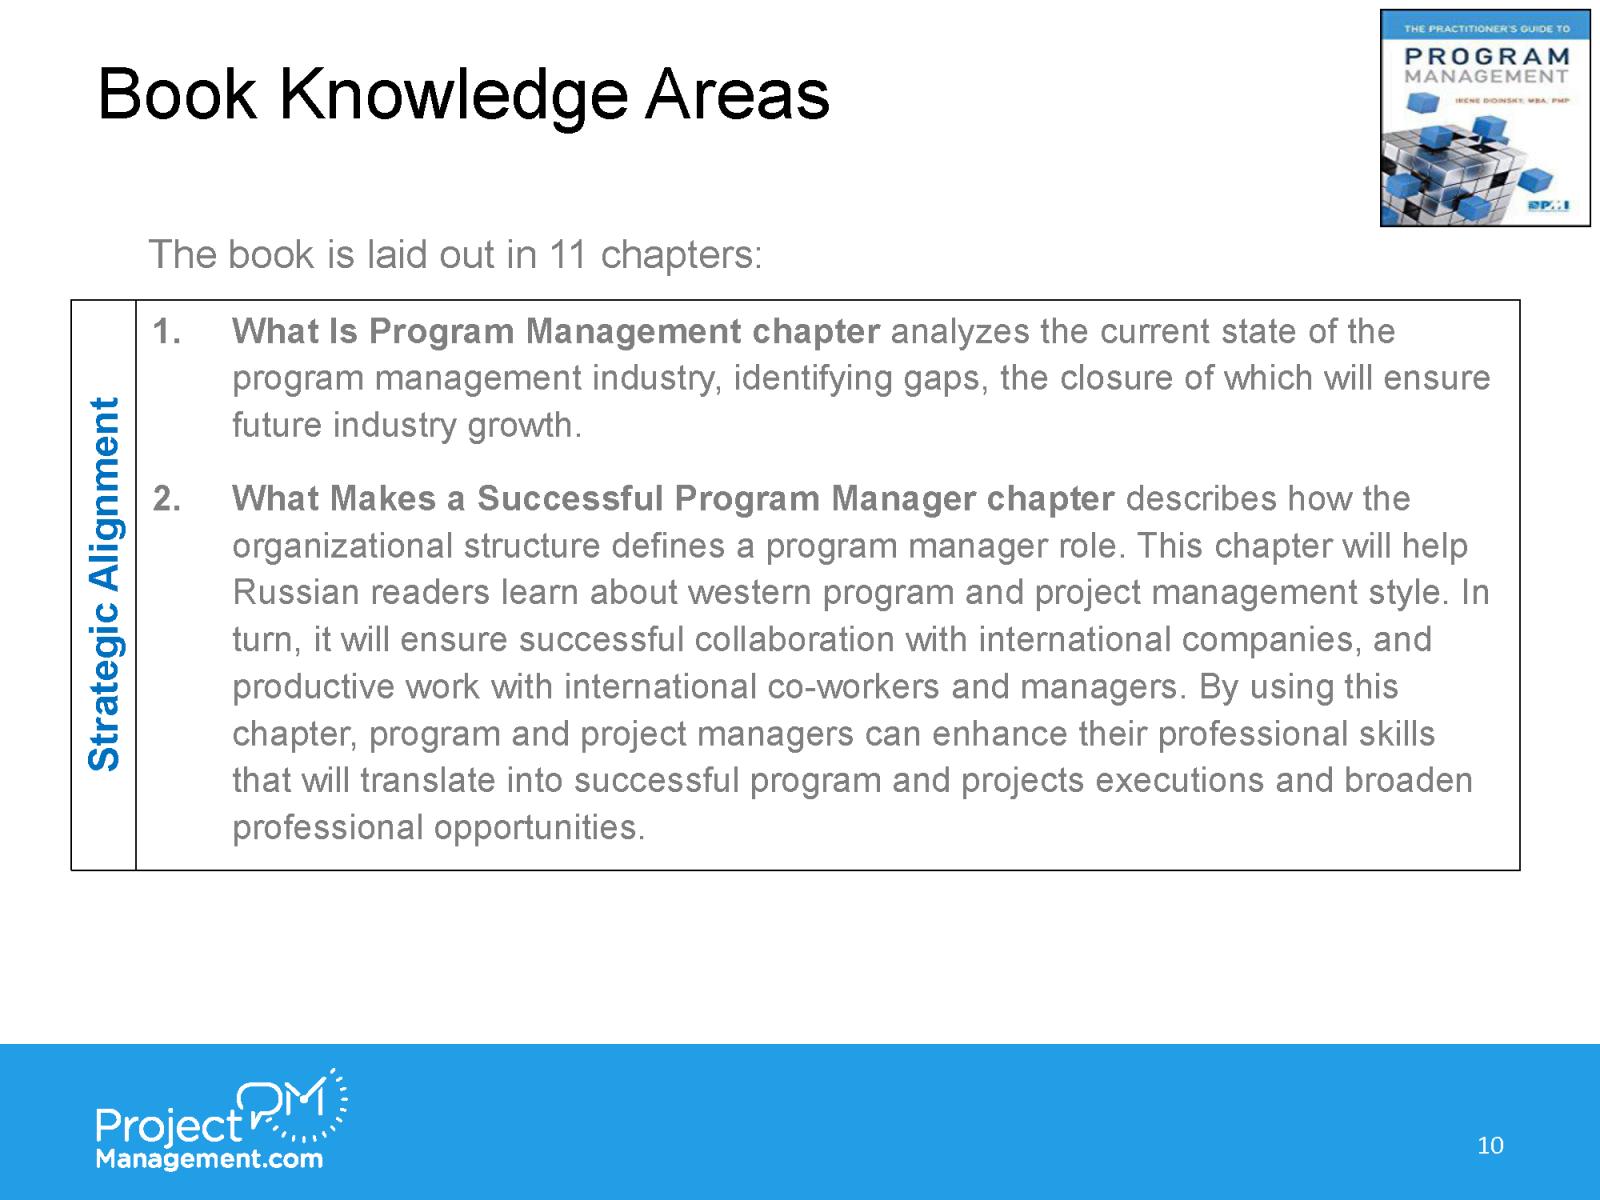 ProjectManagementcom webinar_Irene Didinsky_05112018_FinalFinal_Page_10